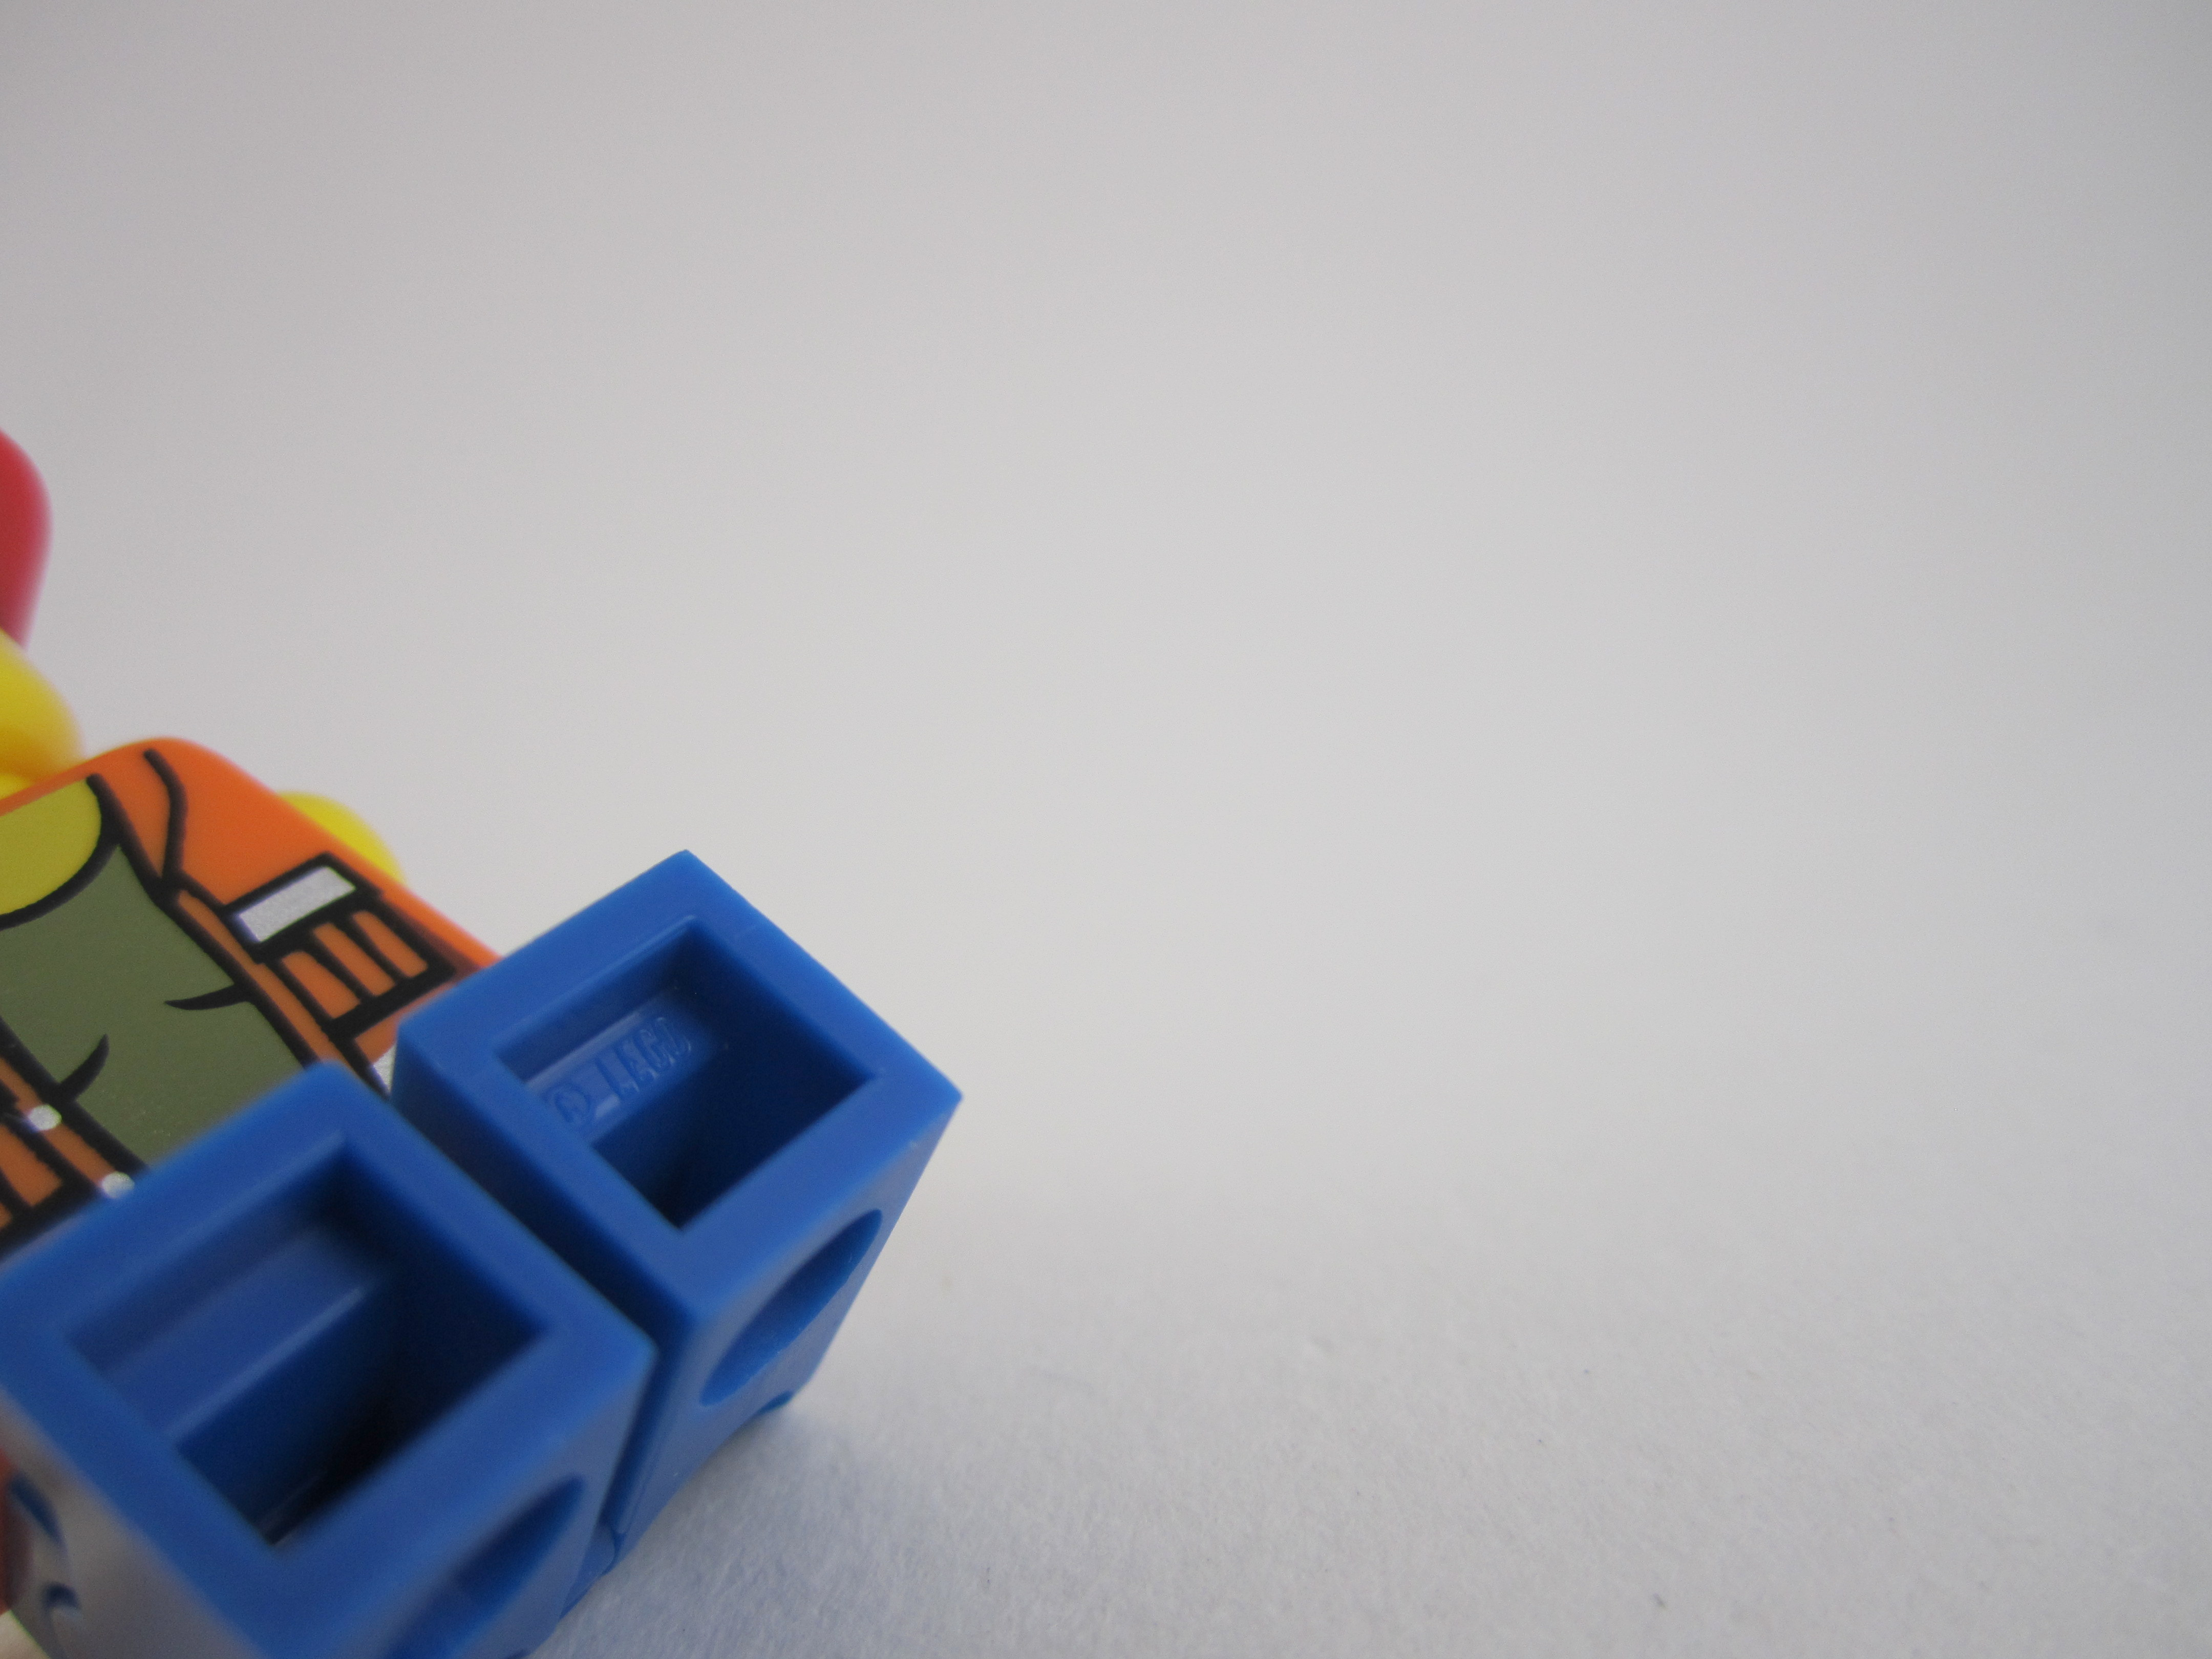 Chinese Quality Lego